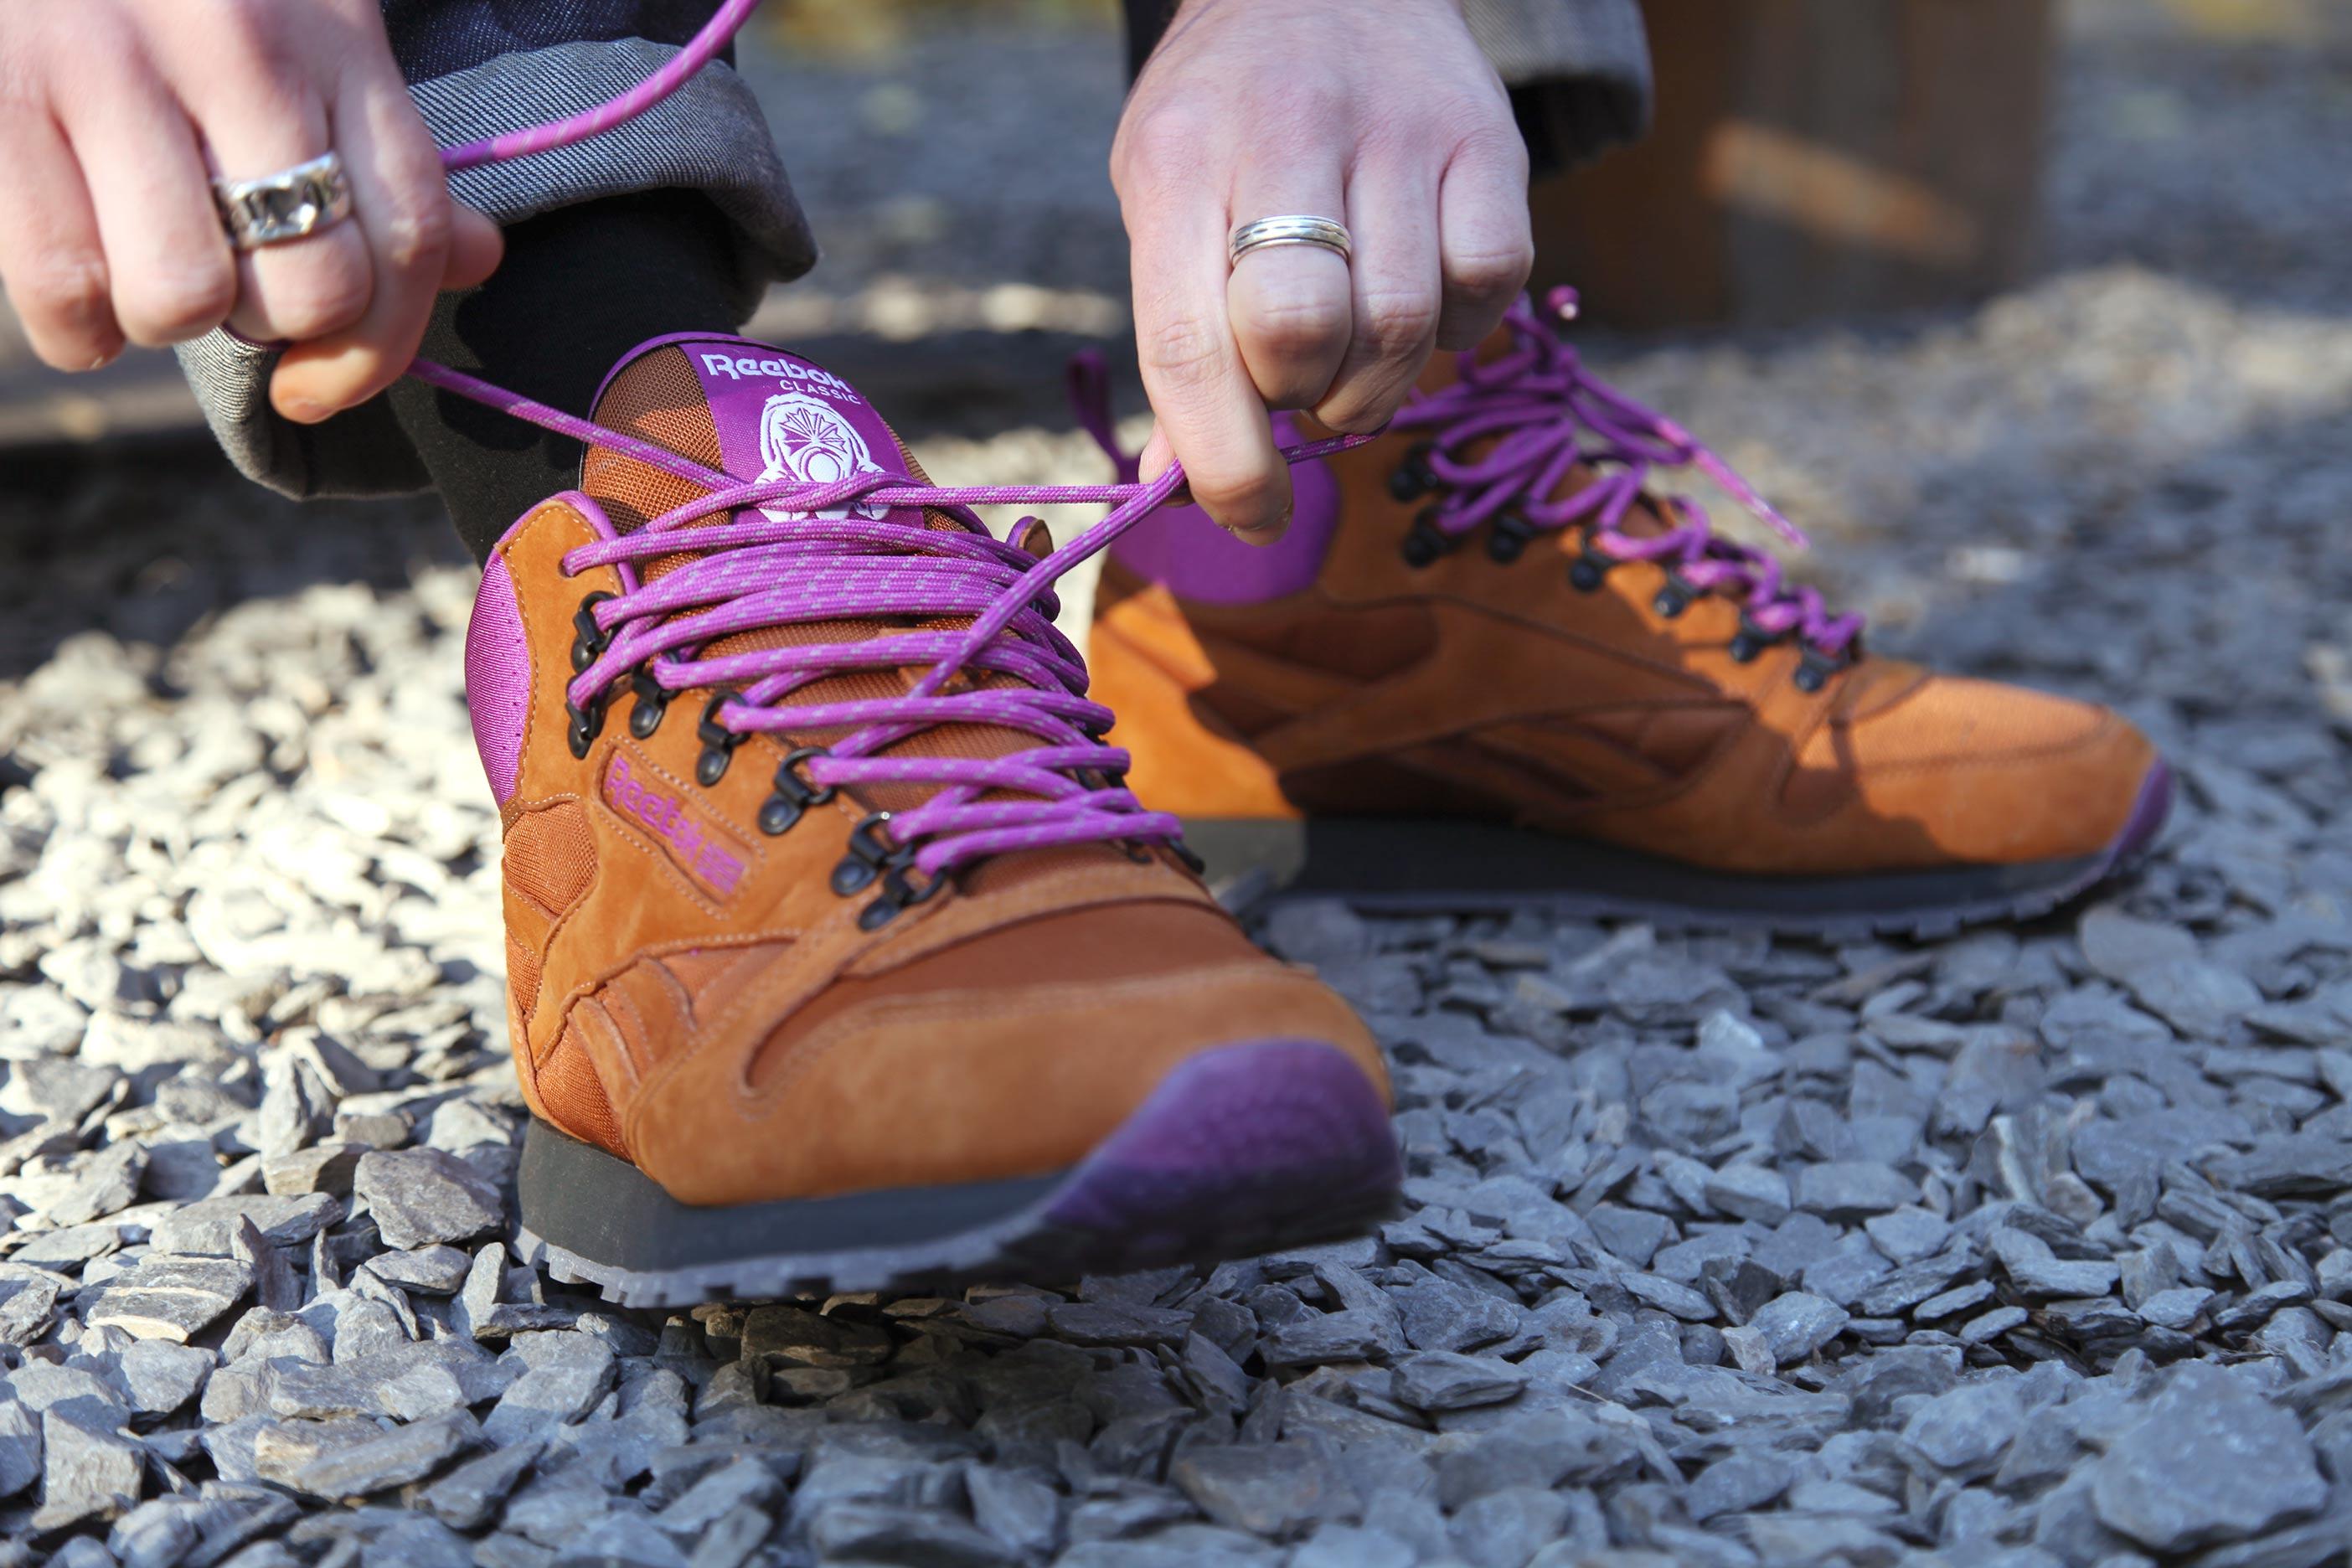 foot-patrol-reebok-classic-leather-mid-on-the-rocks-5